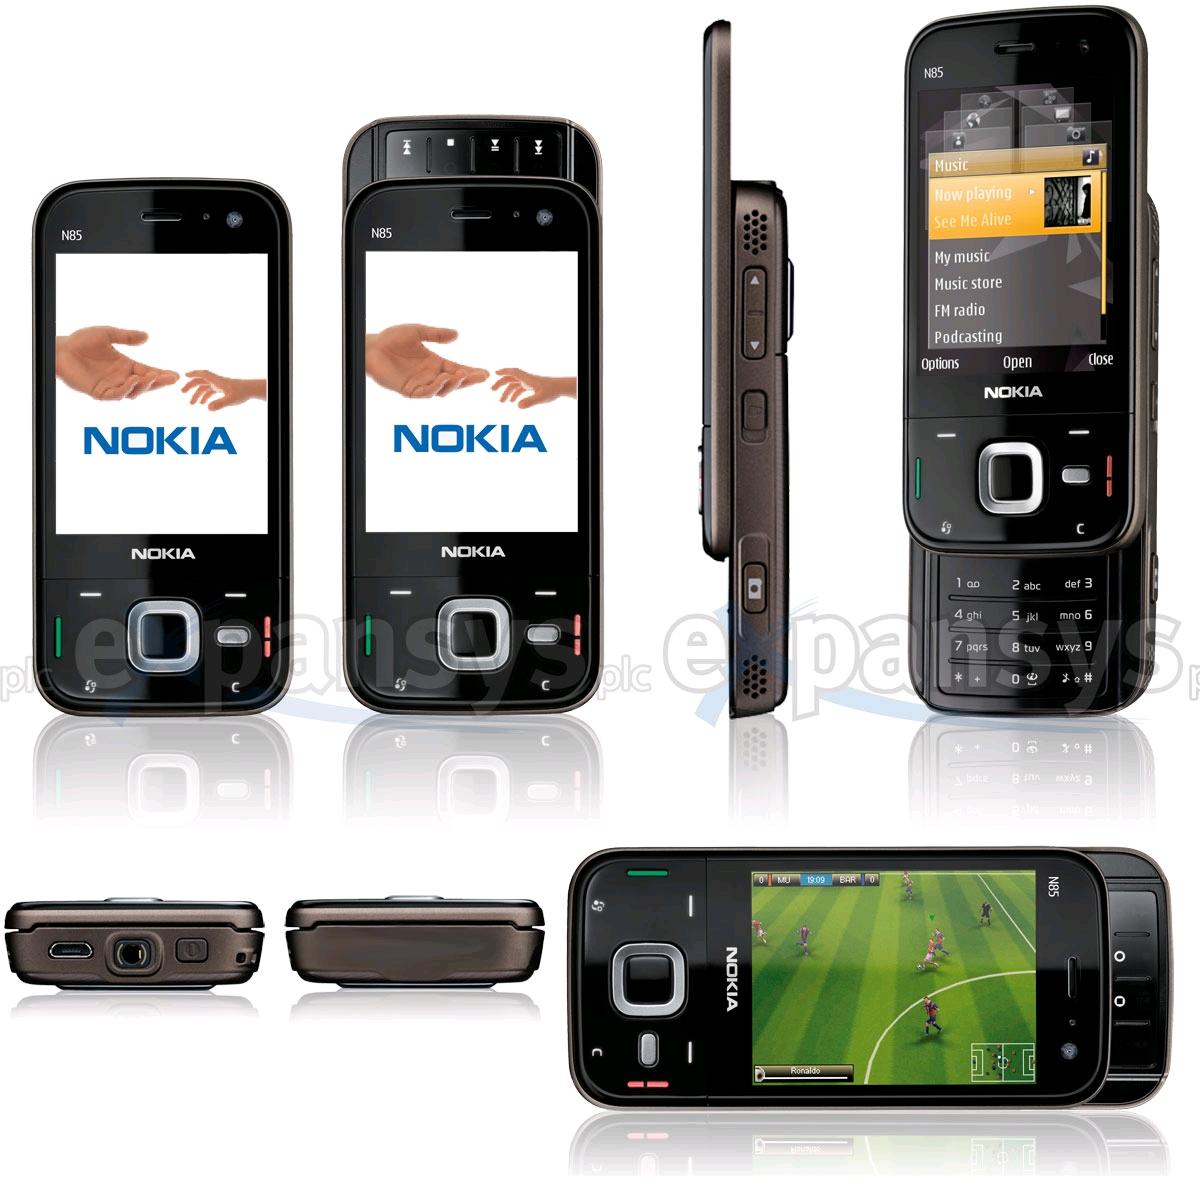 http://3.bp.blogspot.com/-LvzGBeZz8g8/TkfZ1opXs1I/AAAAAAAAKcM/epg-xGHr8Sc/s1600/Nokia+N85+Picture+%25283%2529.jpg